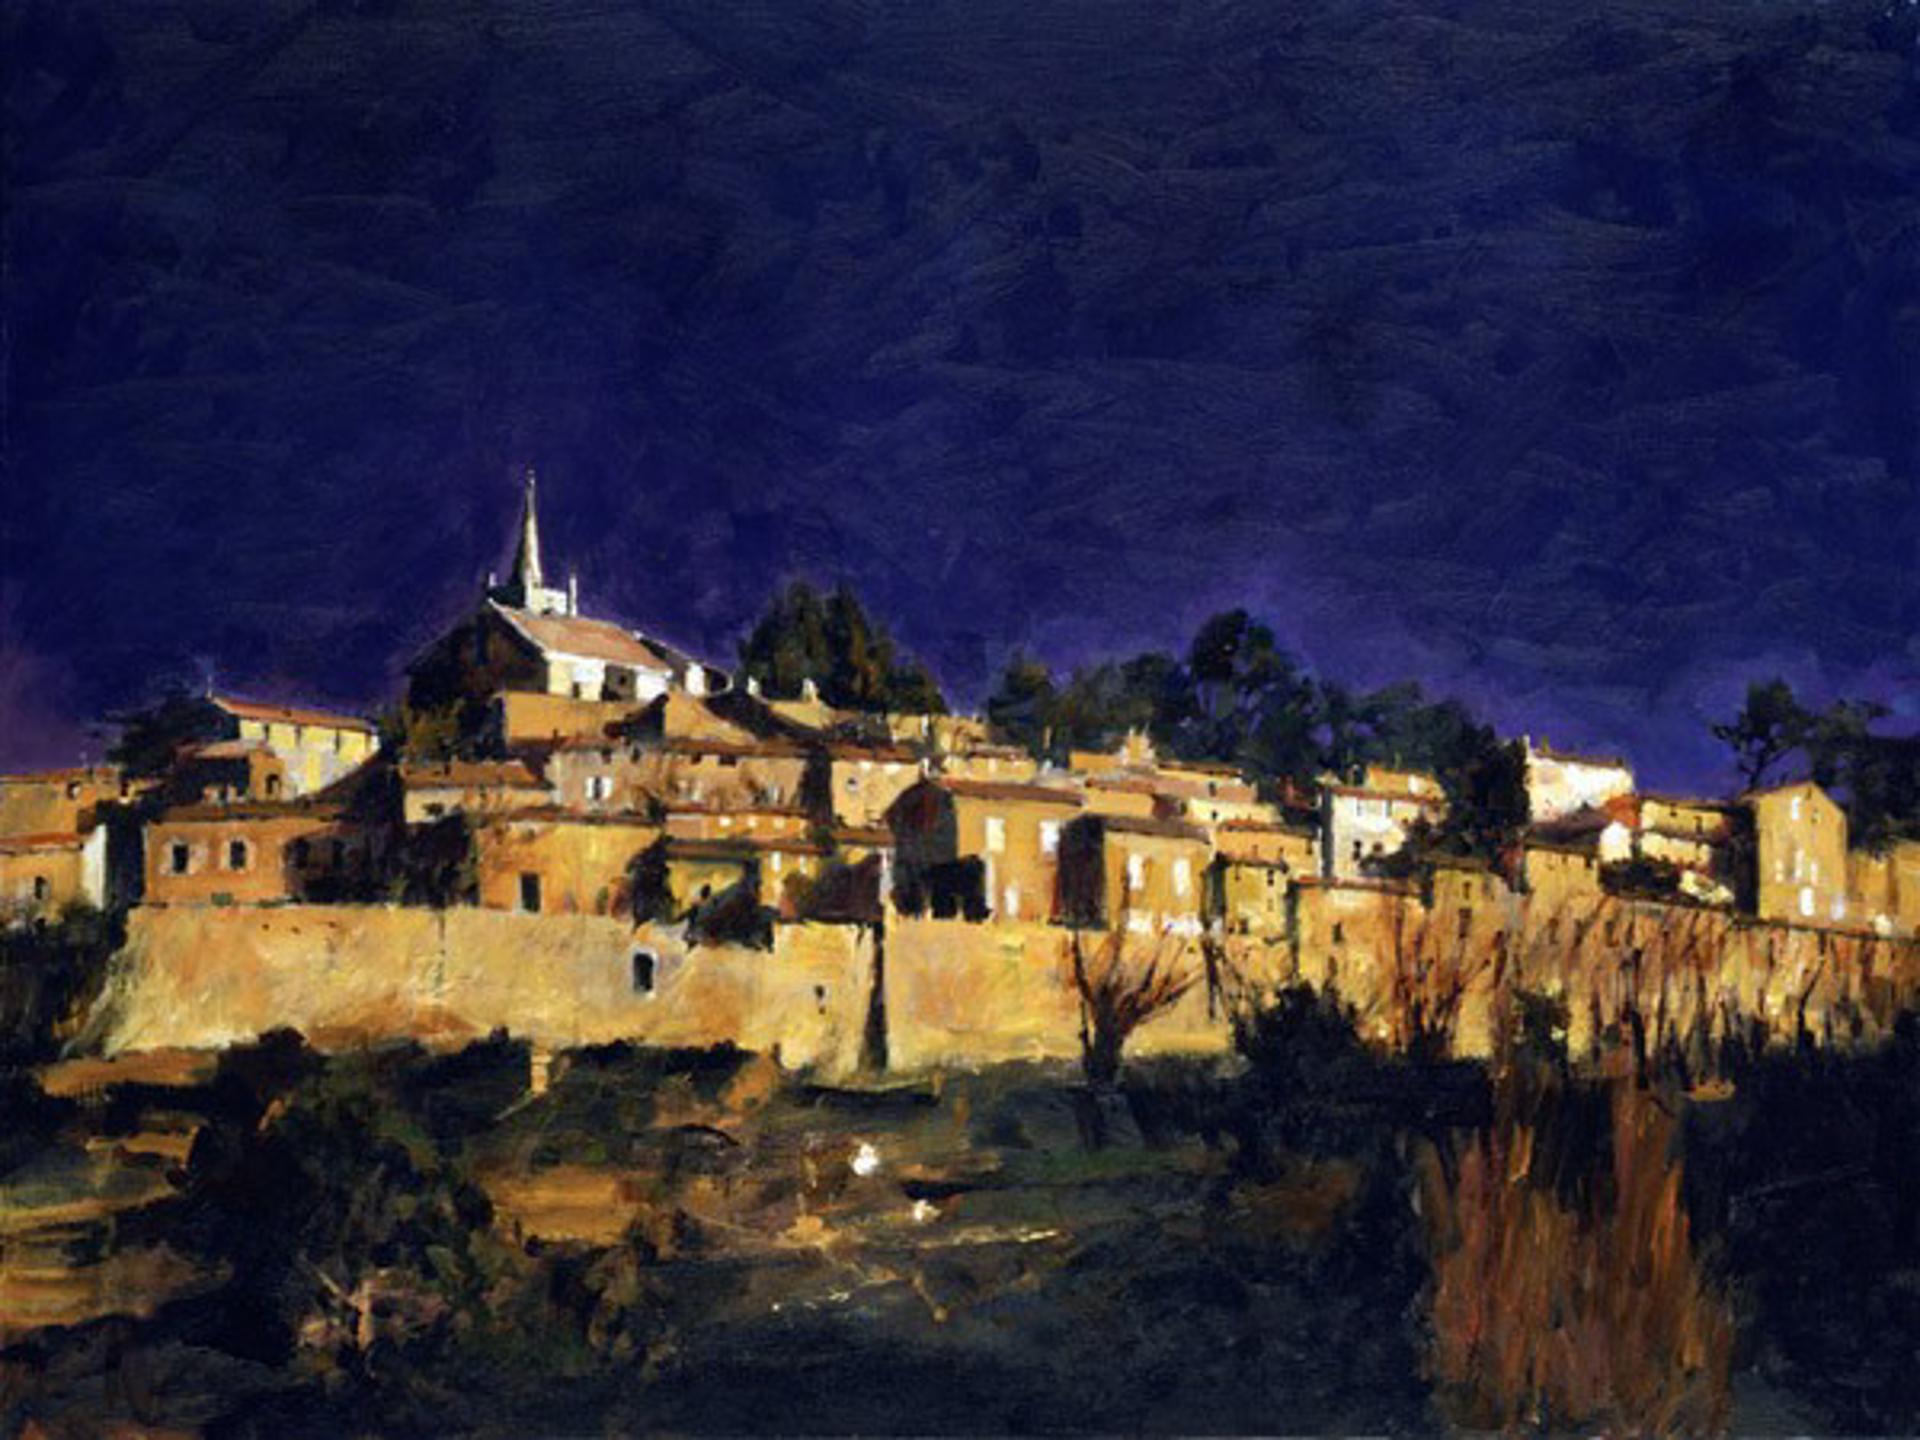 European Village by Aldo Luongo